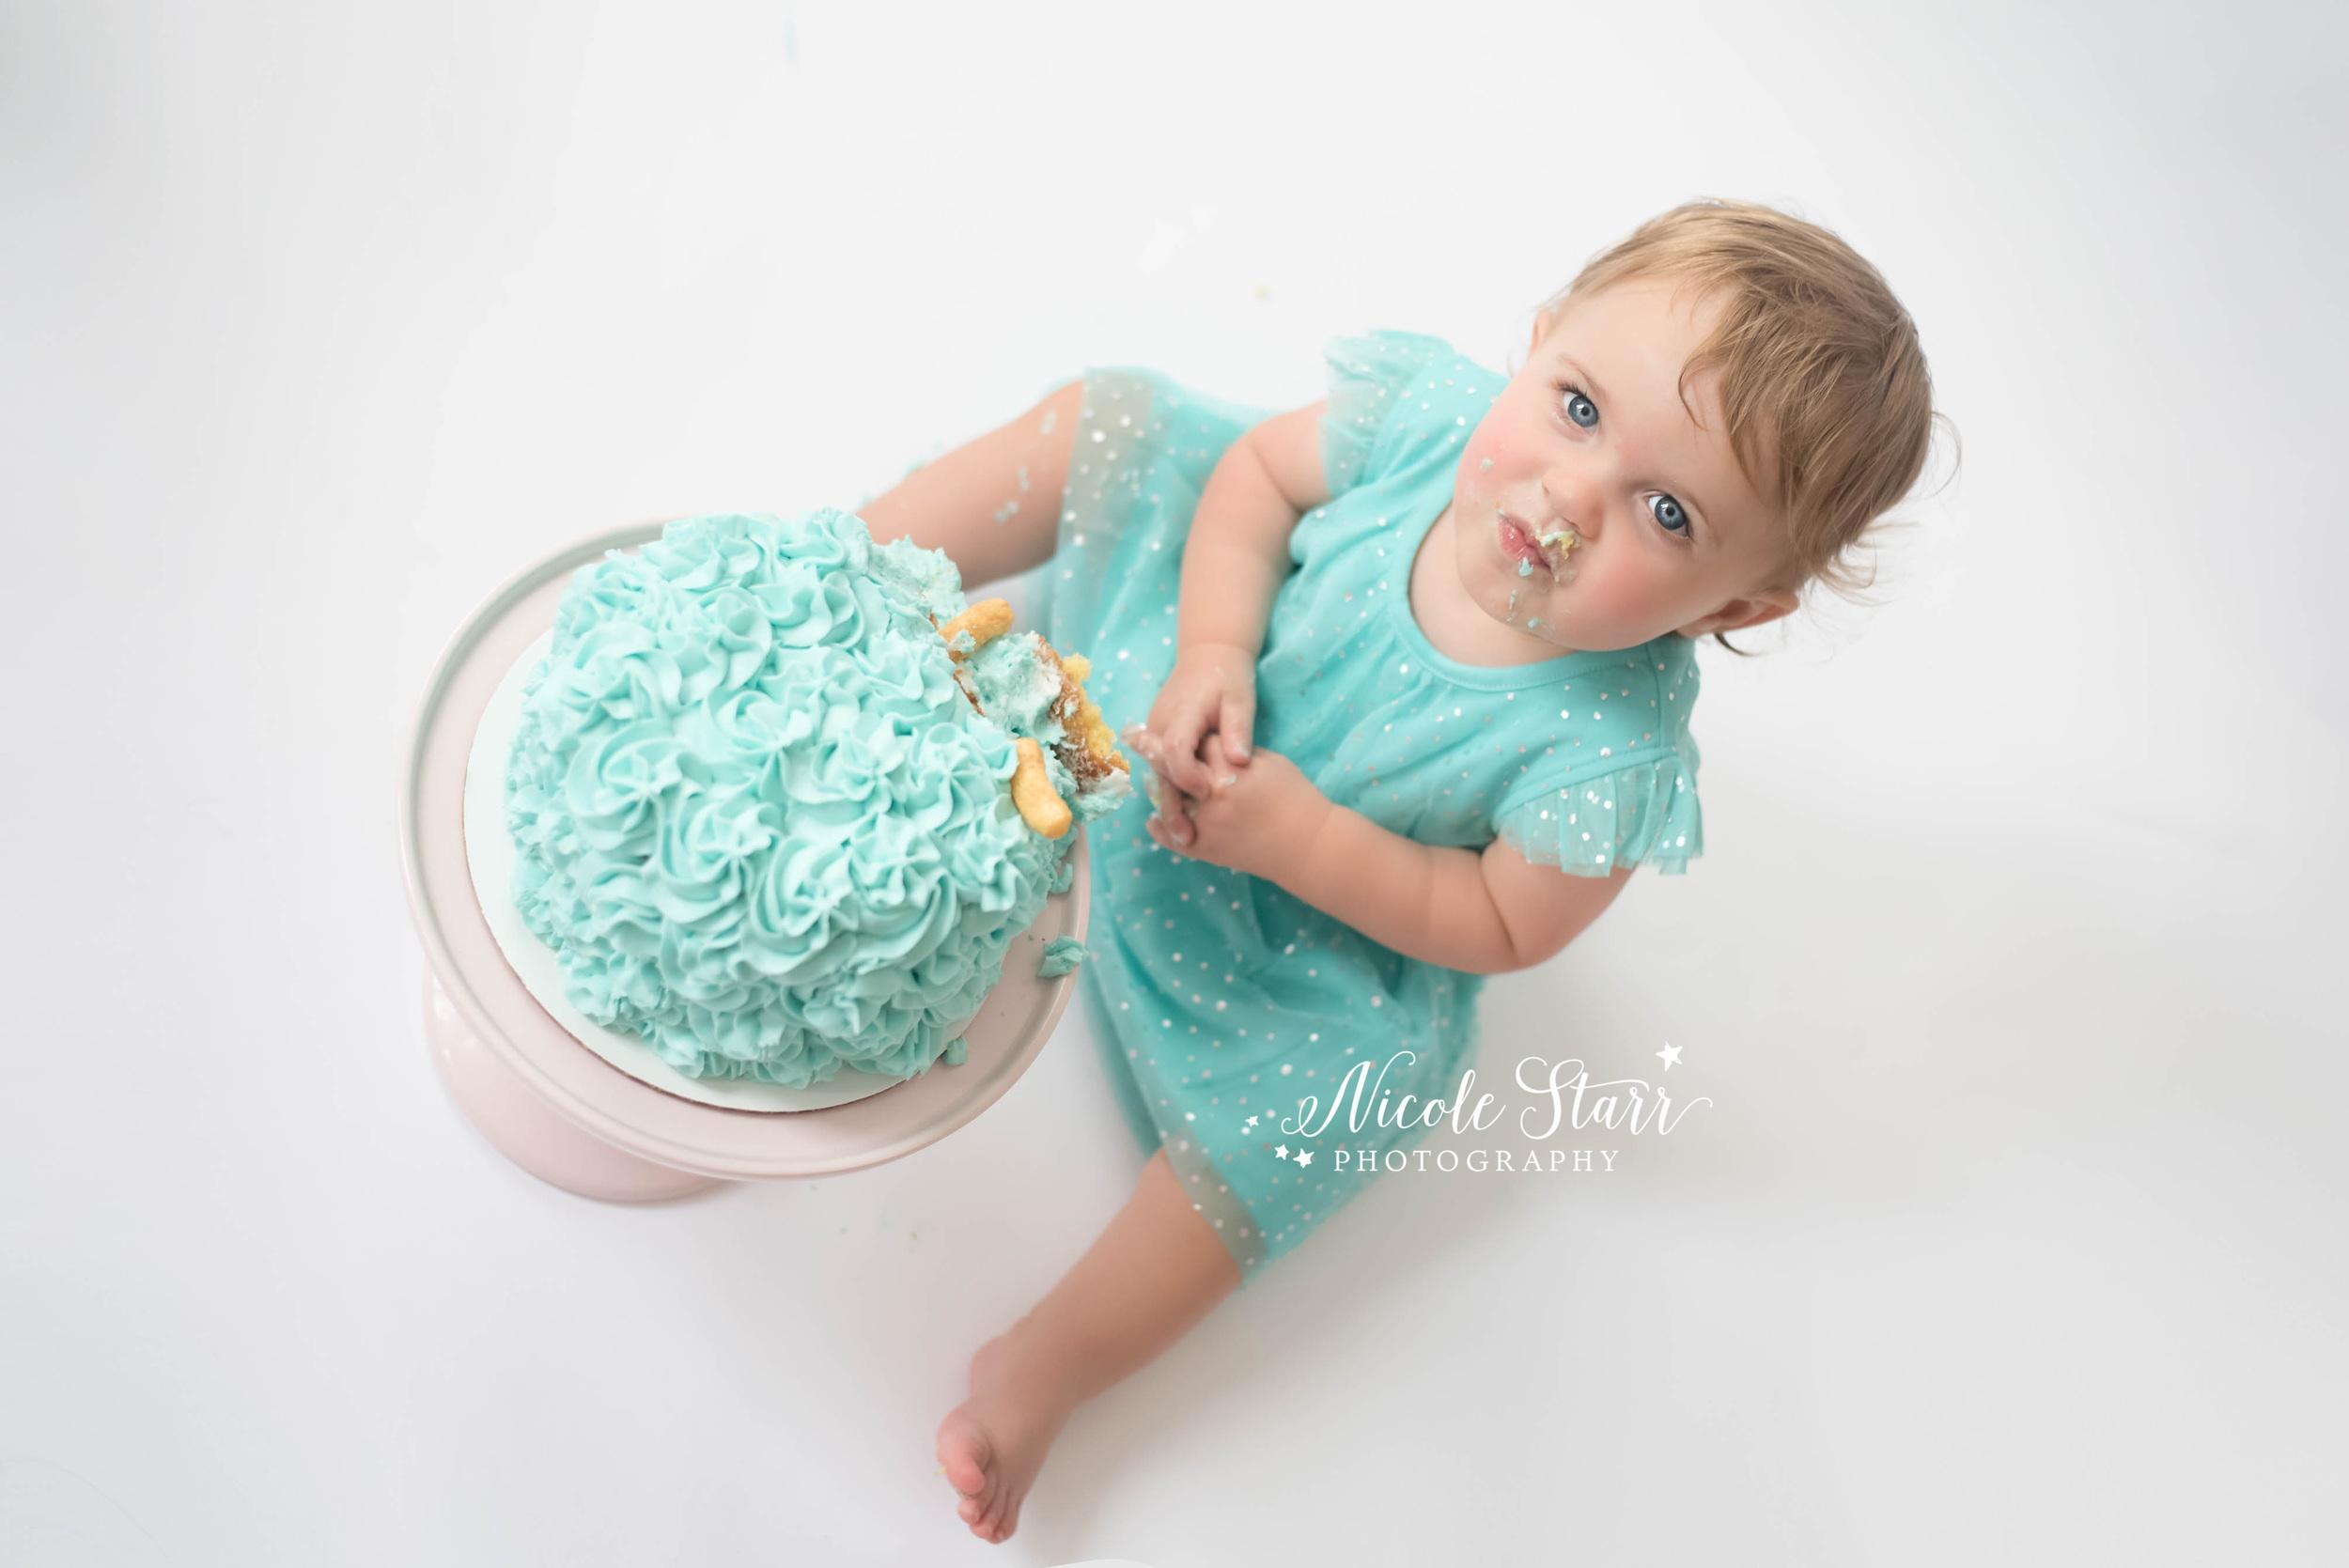 albany cake smash photographer 2.jpg